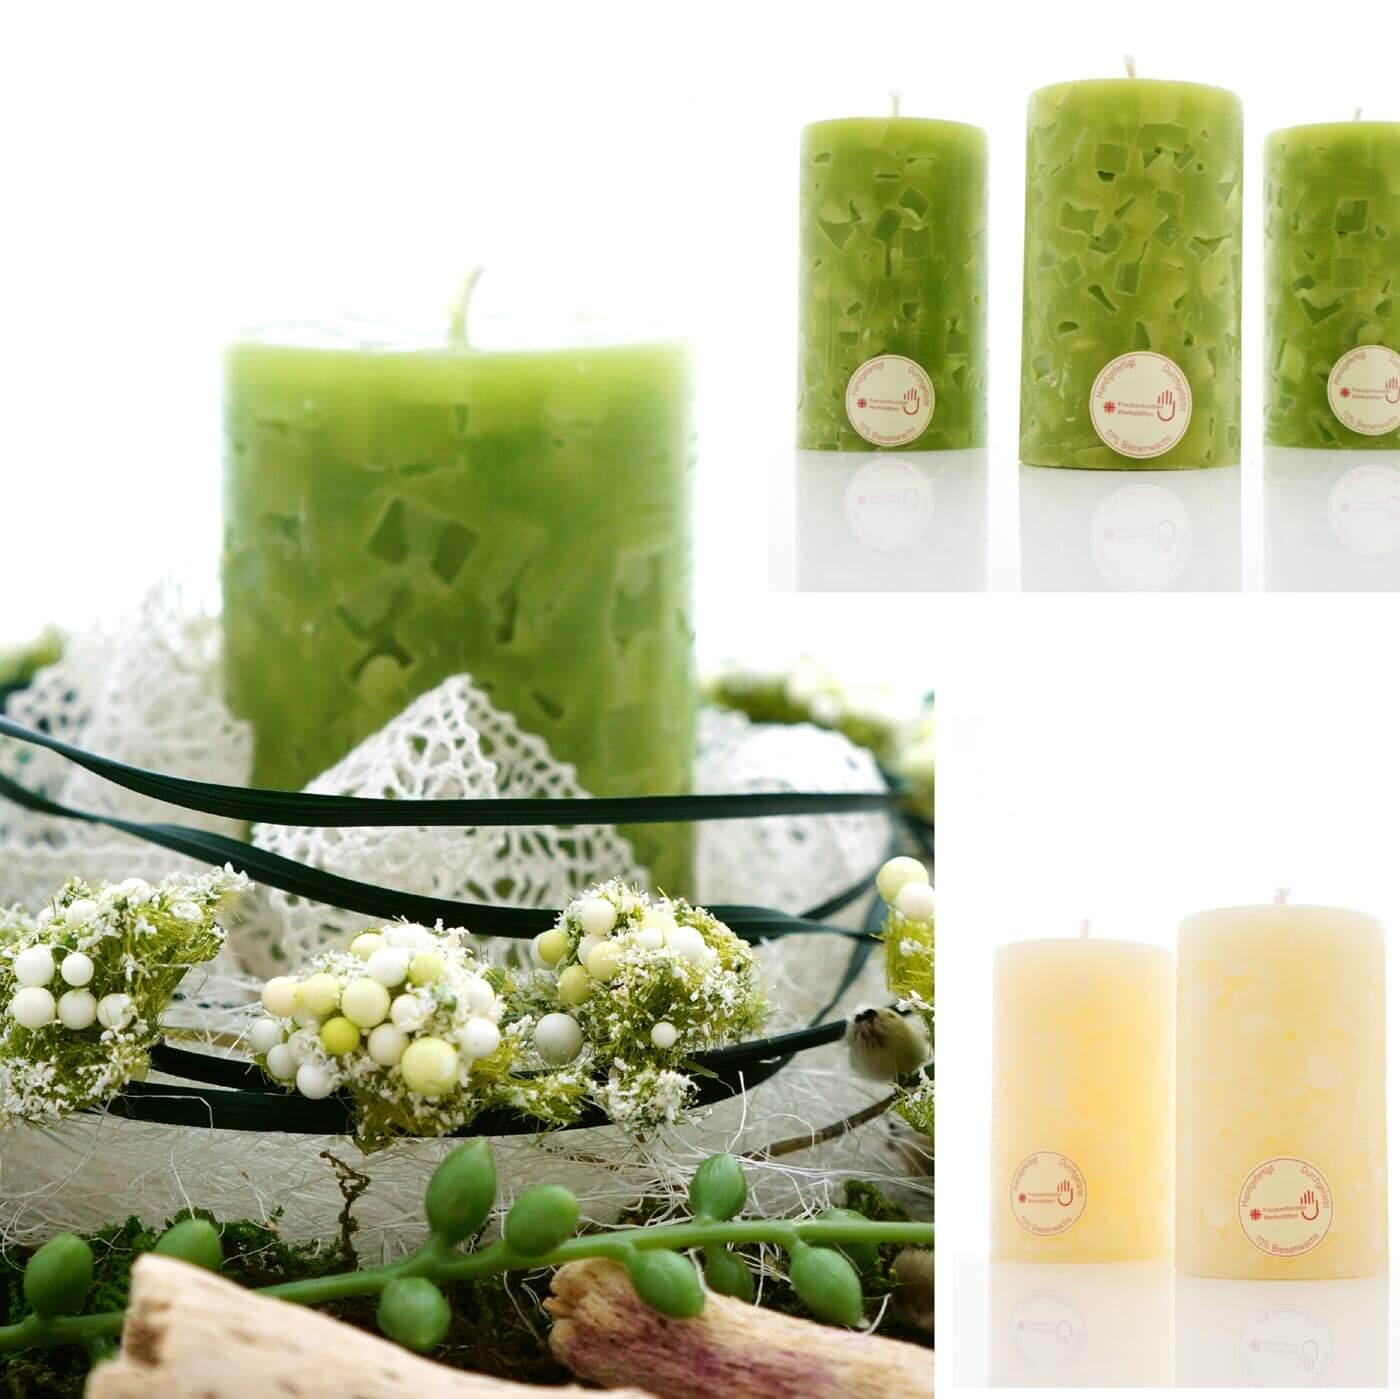 Dekoration mit kerzen hochzeitsportal24 for Kerzen dekoration